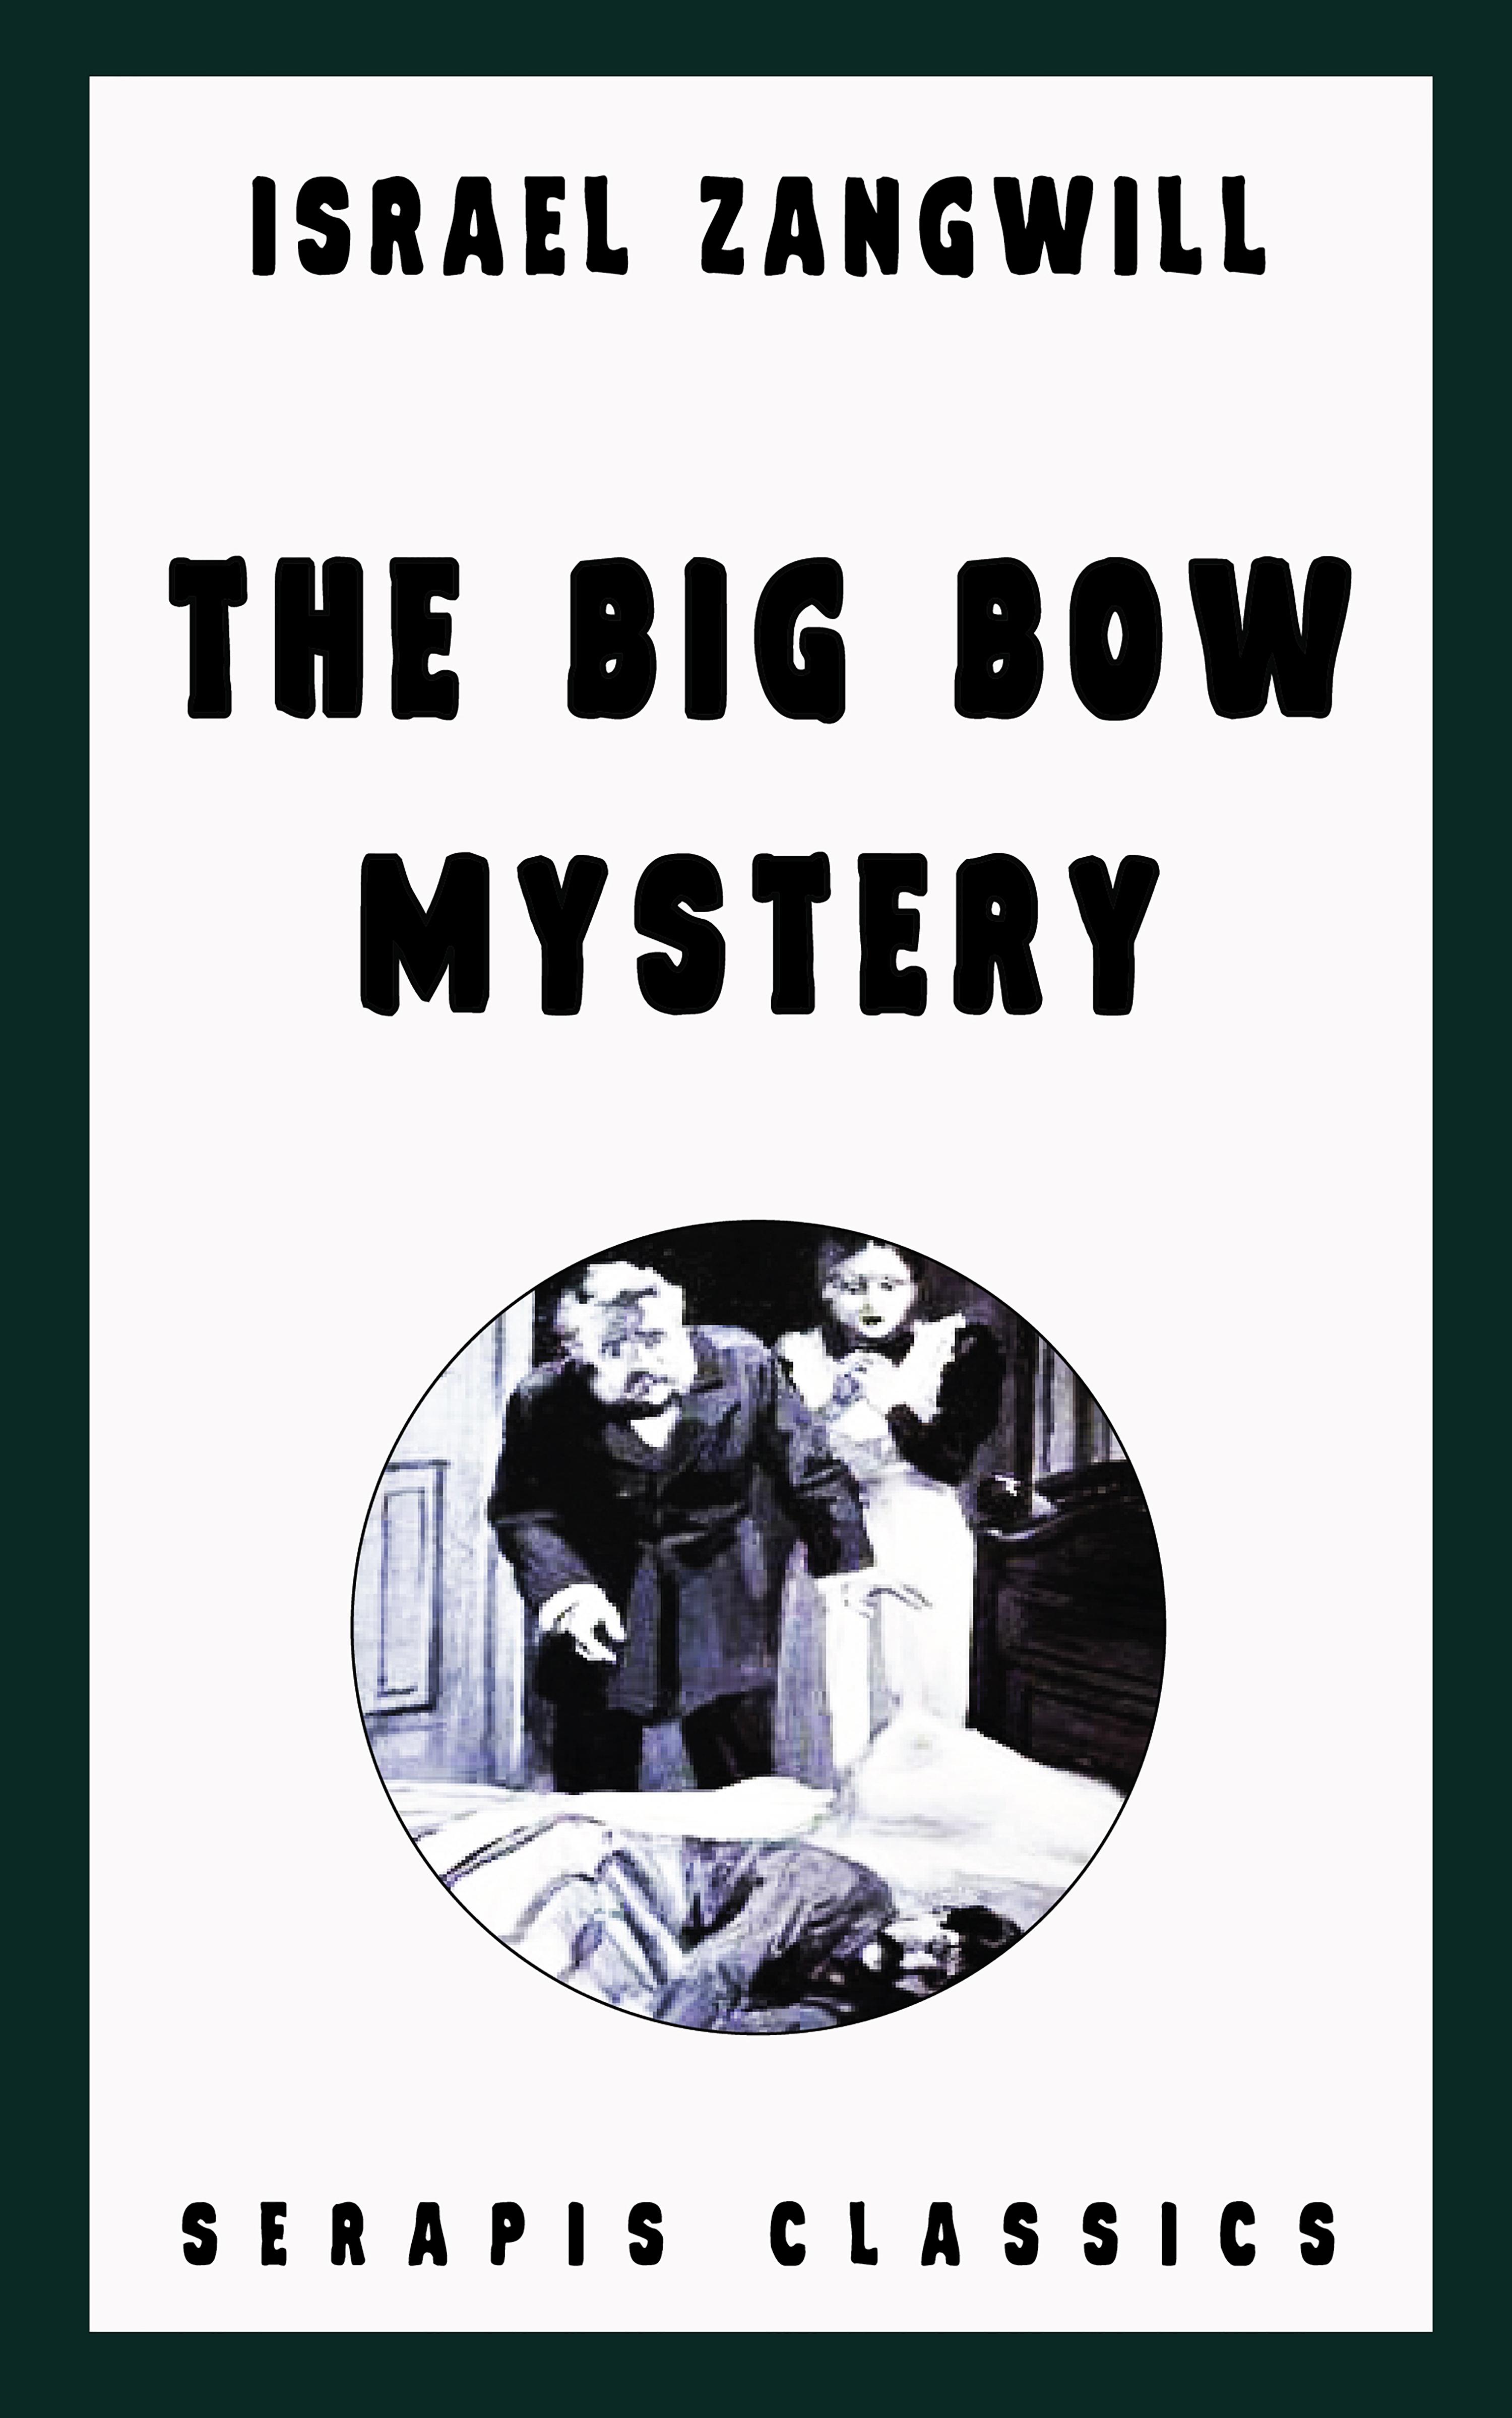 Israel Zangwill The Big Bow Mystery (Serapis Classics)